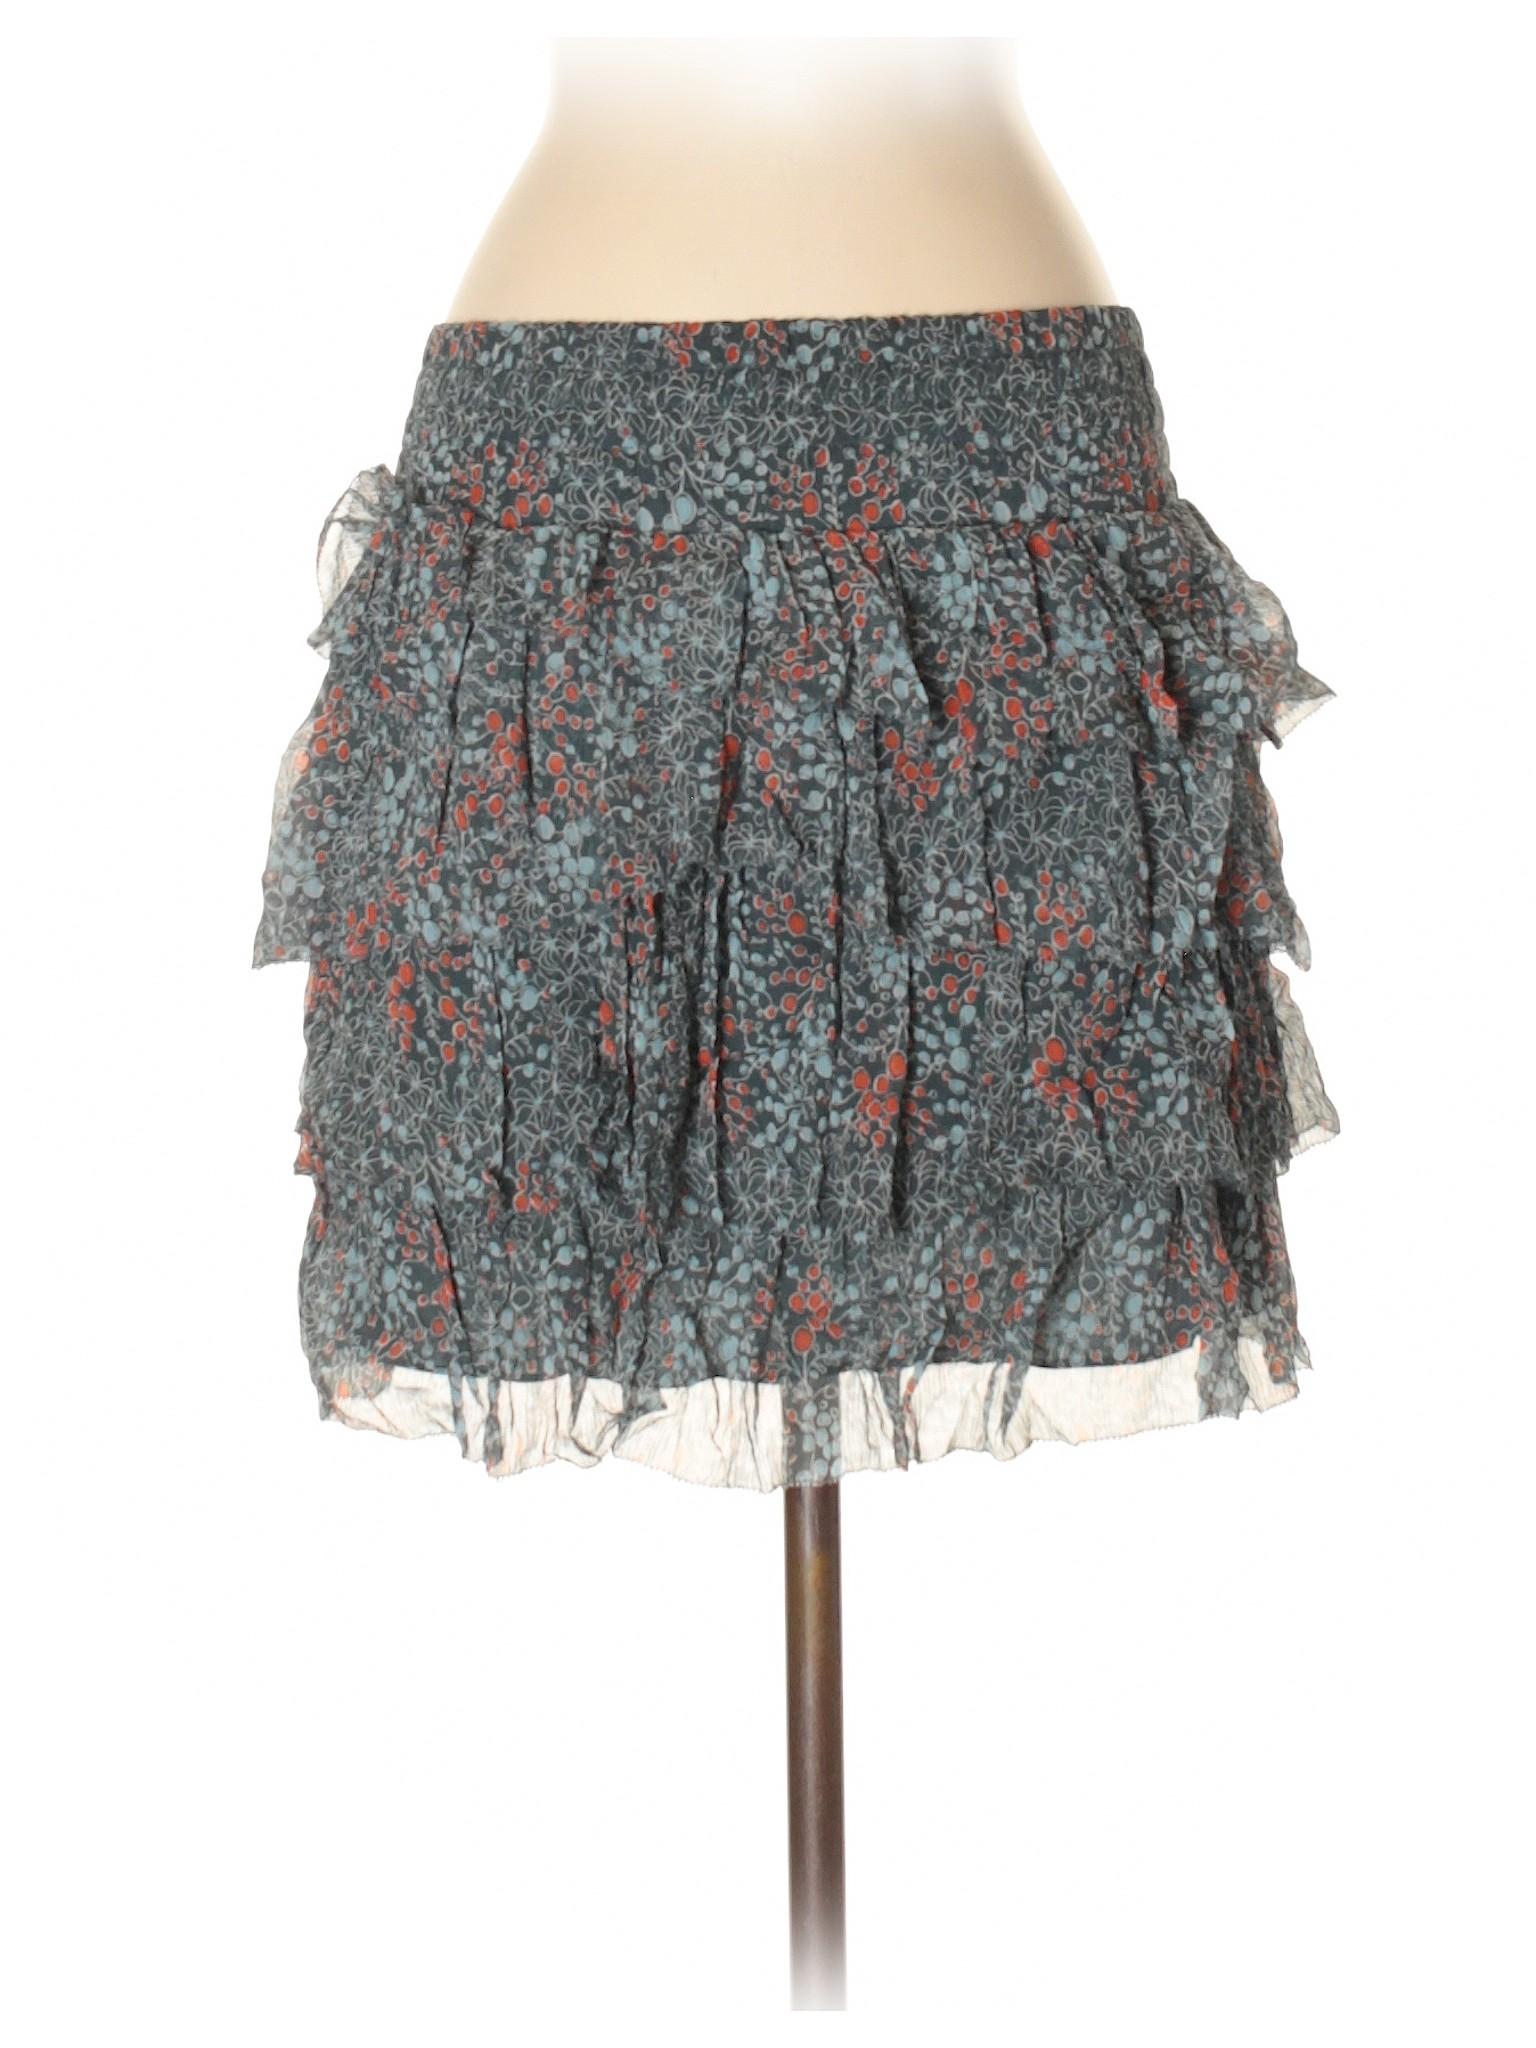 Calypso Barth St Skirt Silk leisure Boutique 5SZxCqw6S